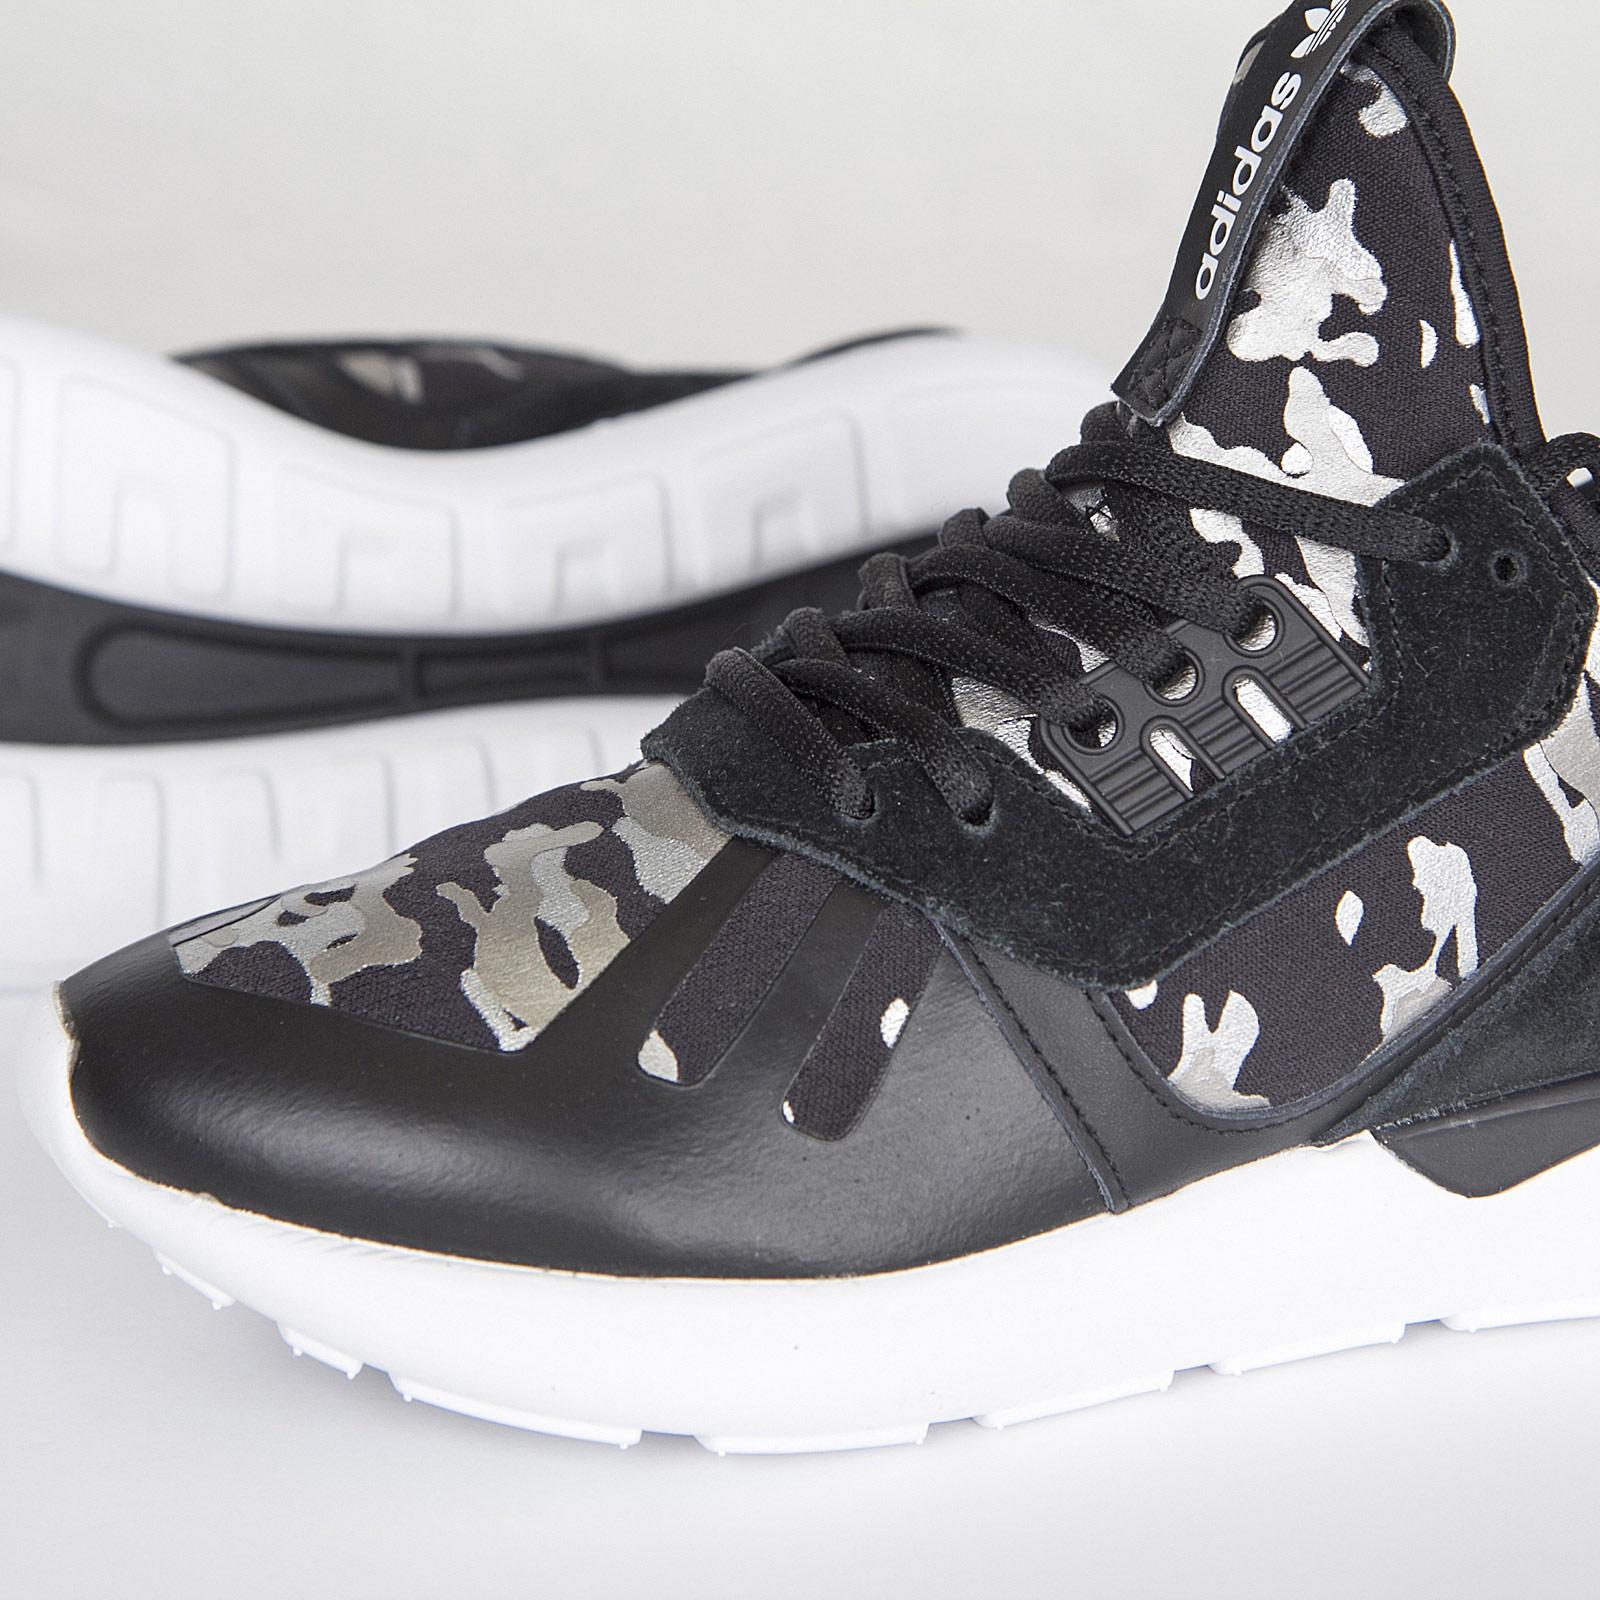 buy online 2d1d7 77fad adidas Tubular Runner W - Af6276 - Sneakersnstuff | sneakers ...